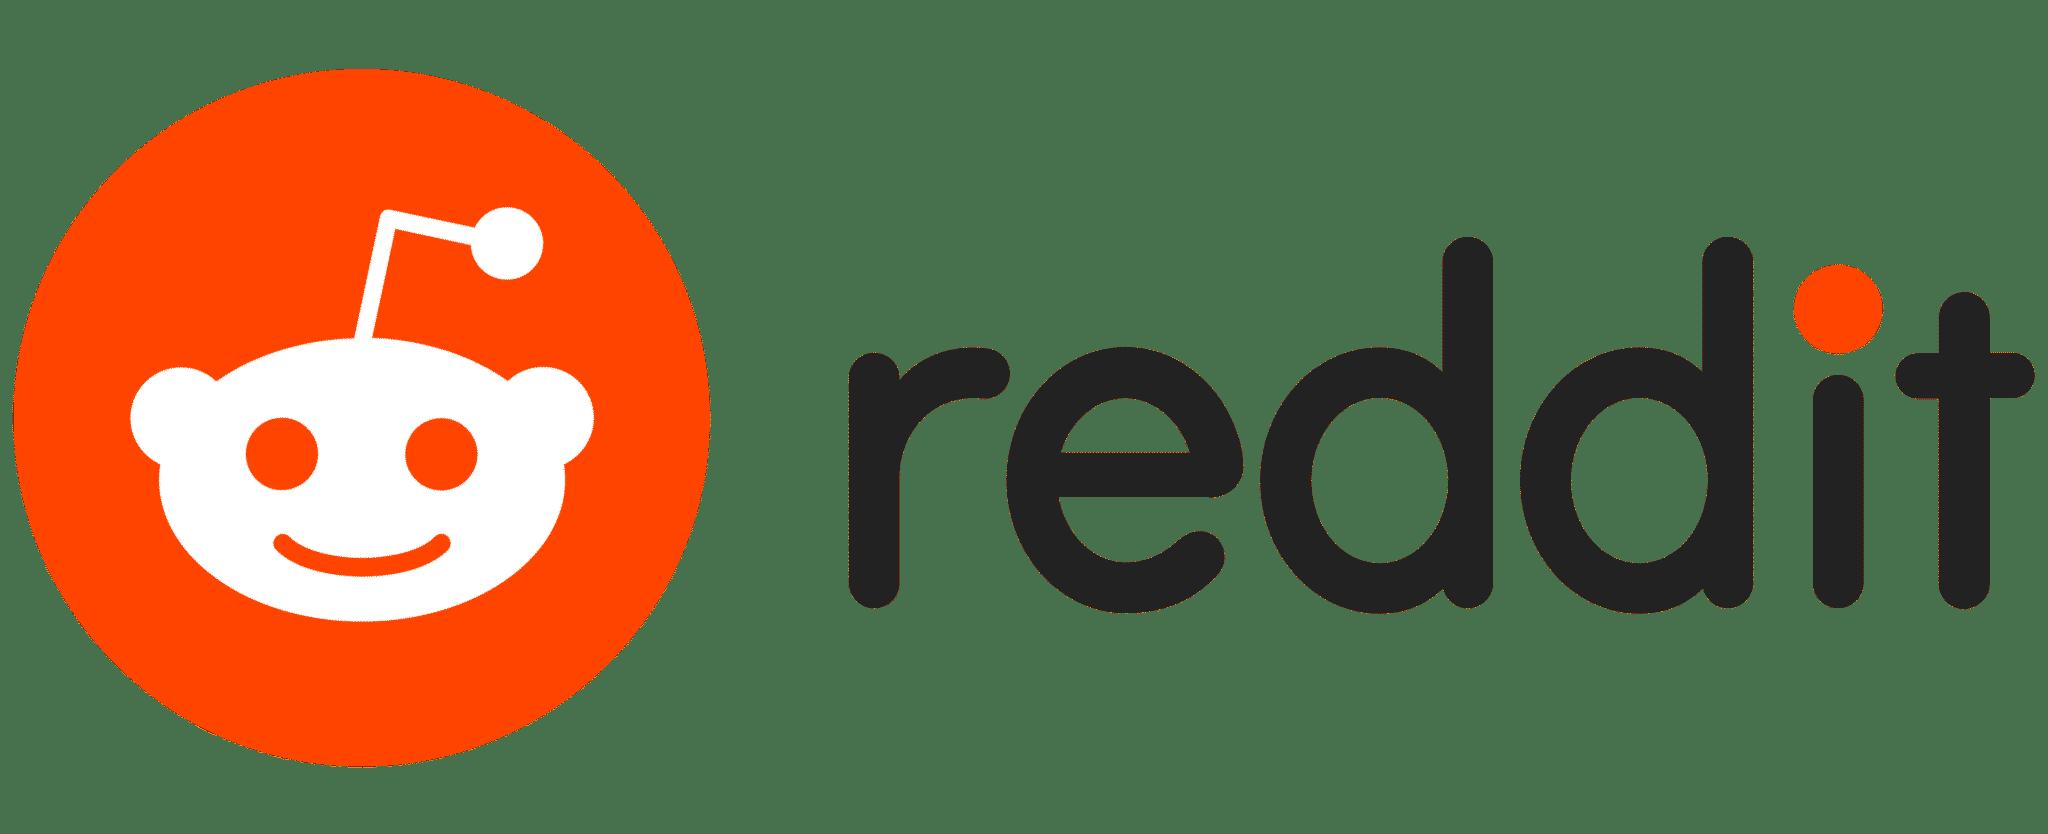 Reddit | Best Facebook Alternatives in 2021